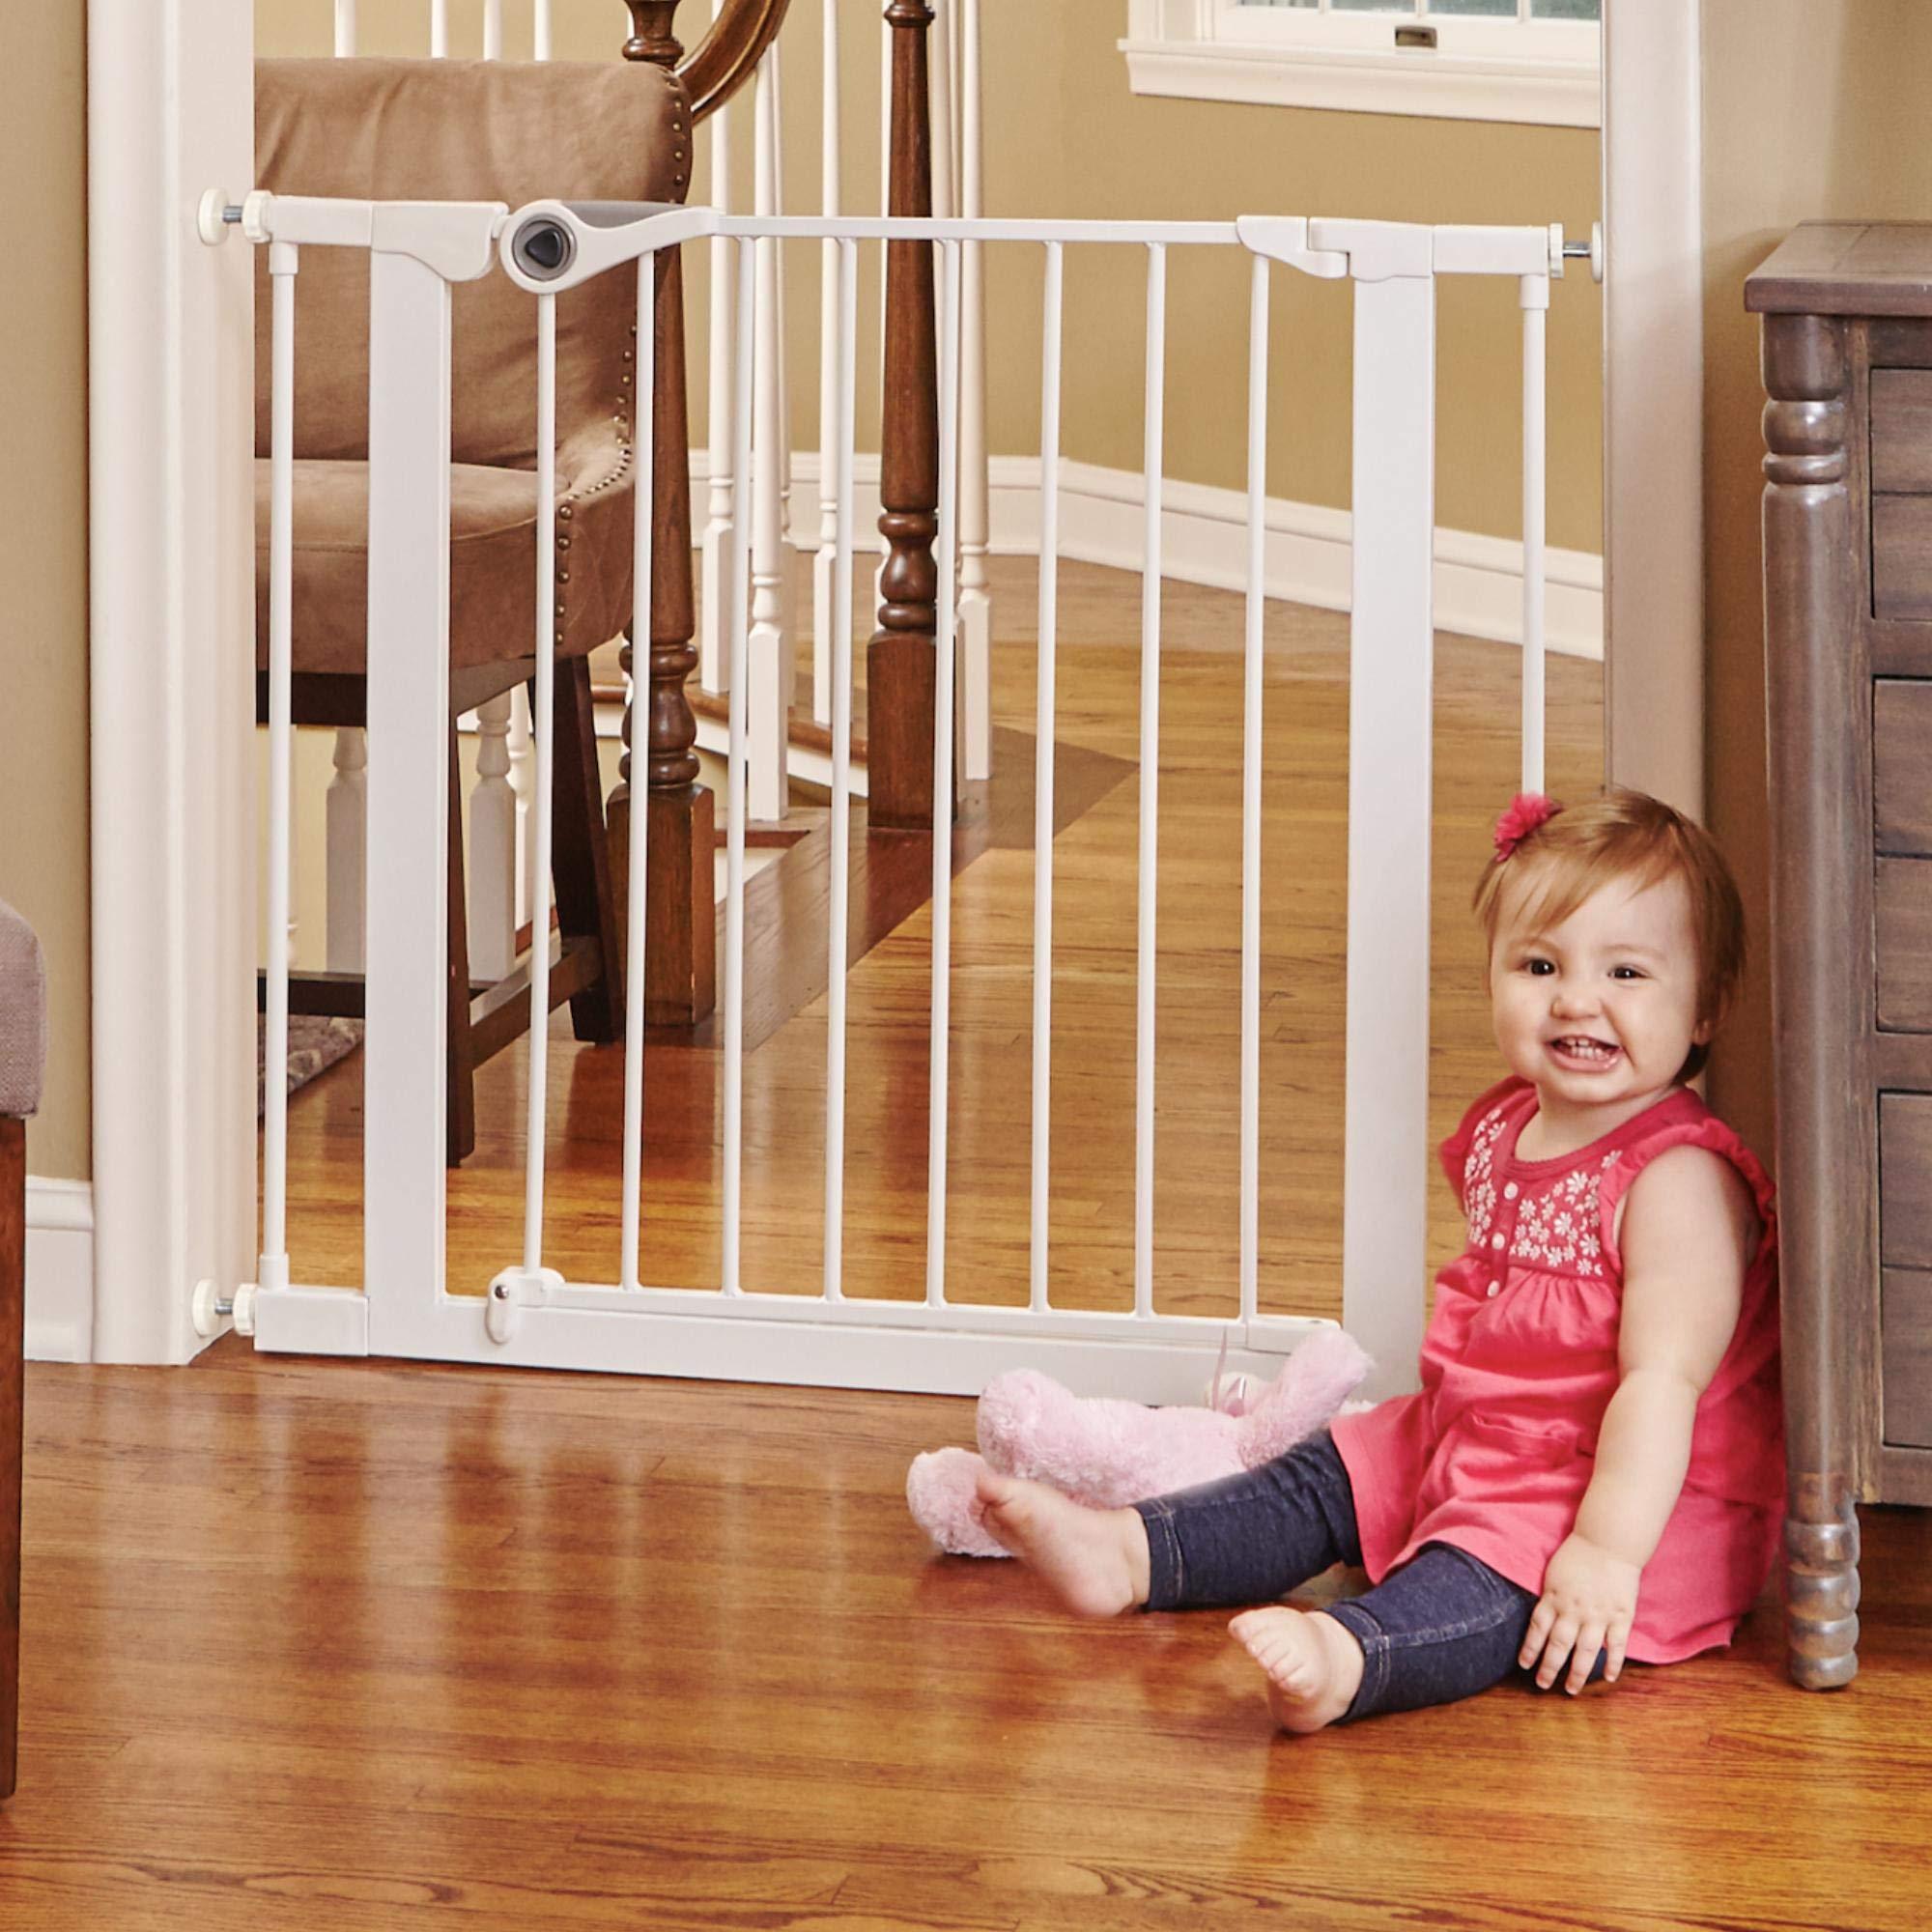 North States 38.1'' Essential Walk-Thru Gate: Ideal for securing hallways or doorways. Extra-Wide Doorway. Pressure Mount. Fits 29.8'' - 38.1'' Wide (30'' Tall, White)